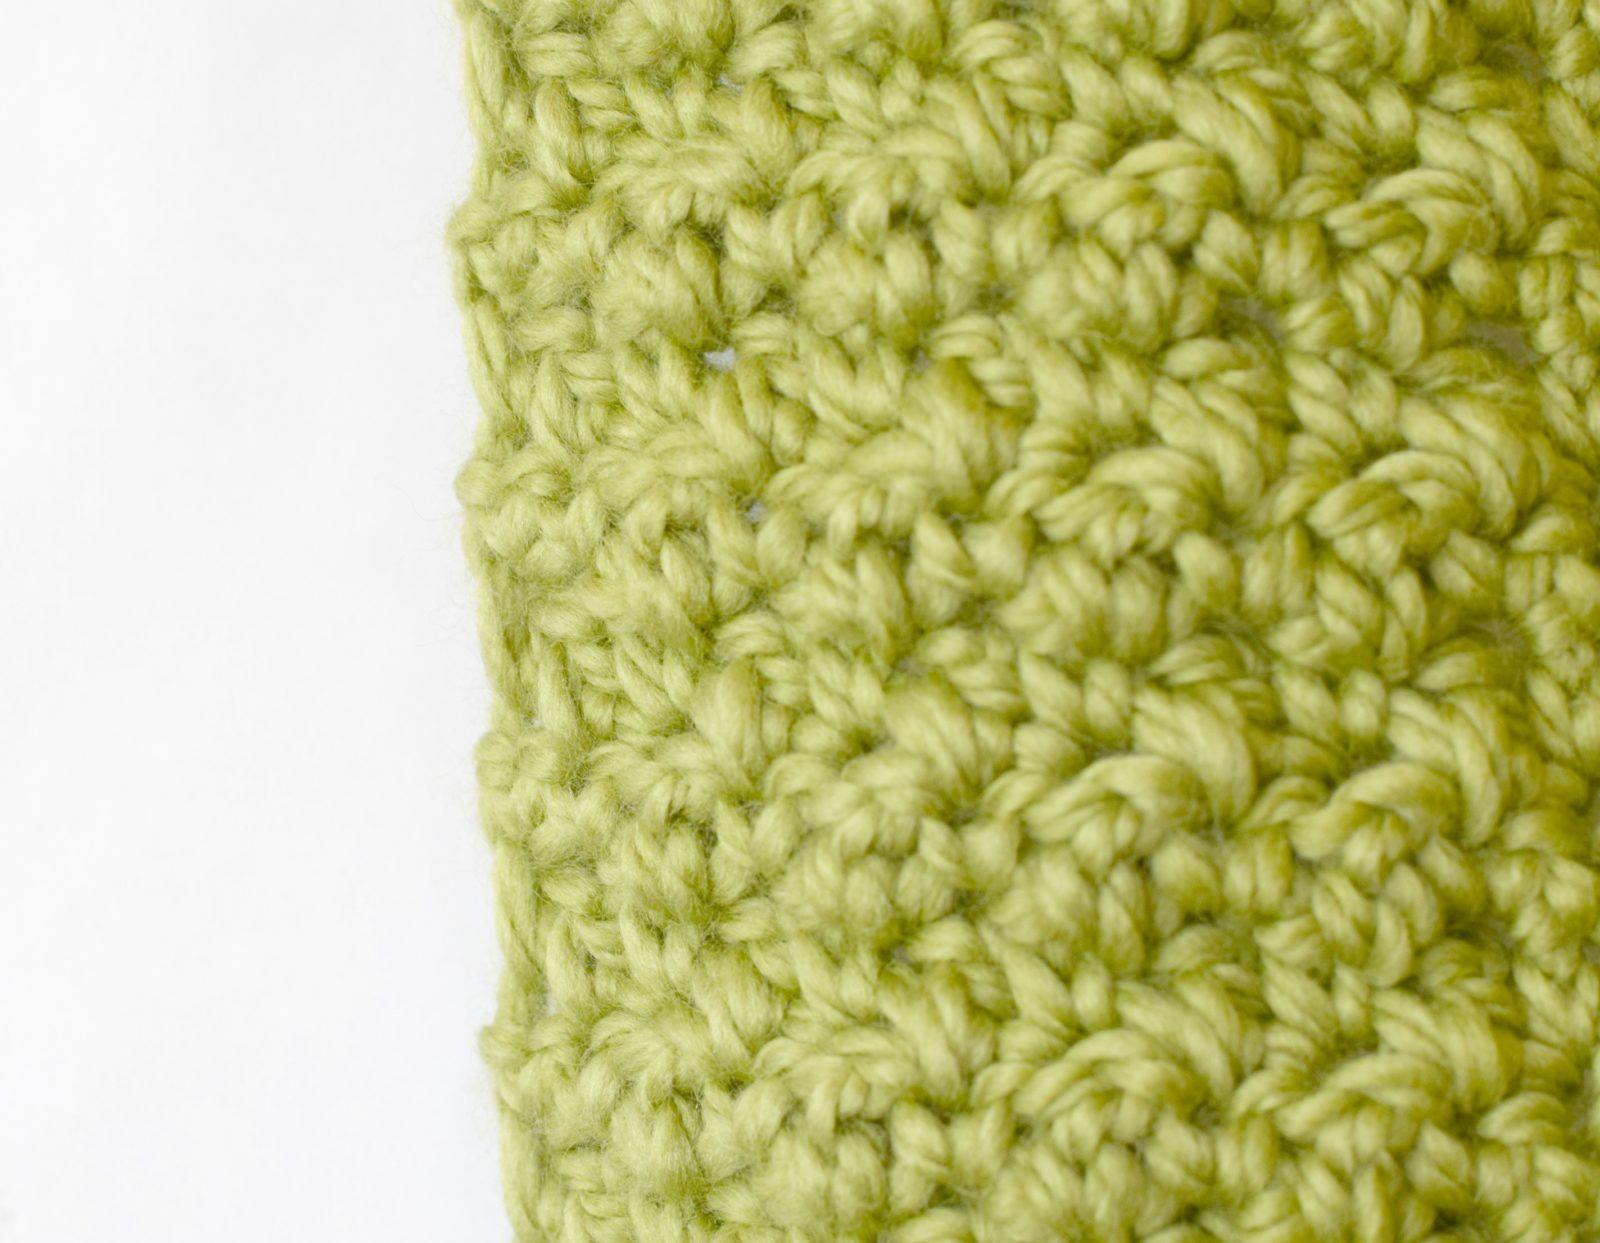 Crochet Scarf Pattern Thick Yarn : Chunky, Squishy Crochet Infinity Scarf Pattern ? Mama In A ...